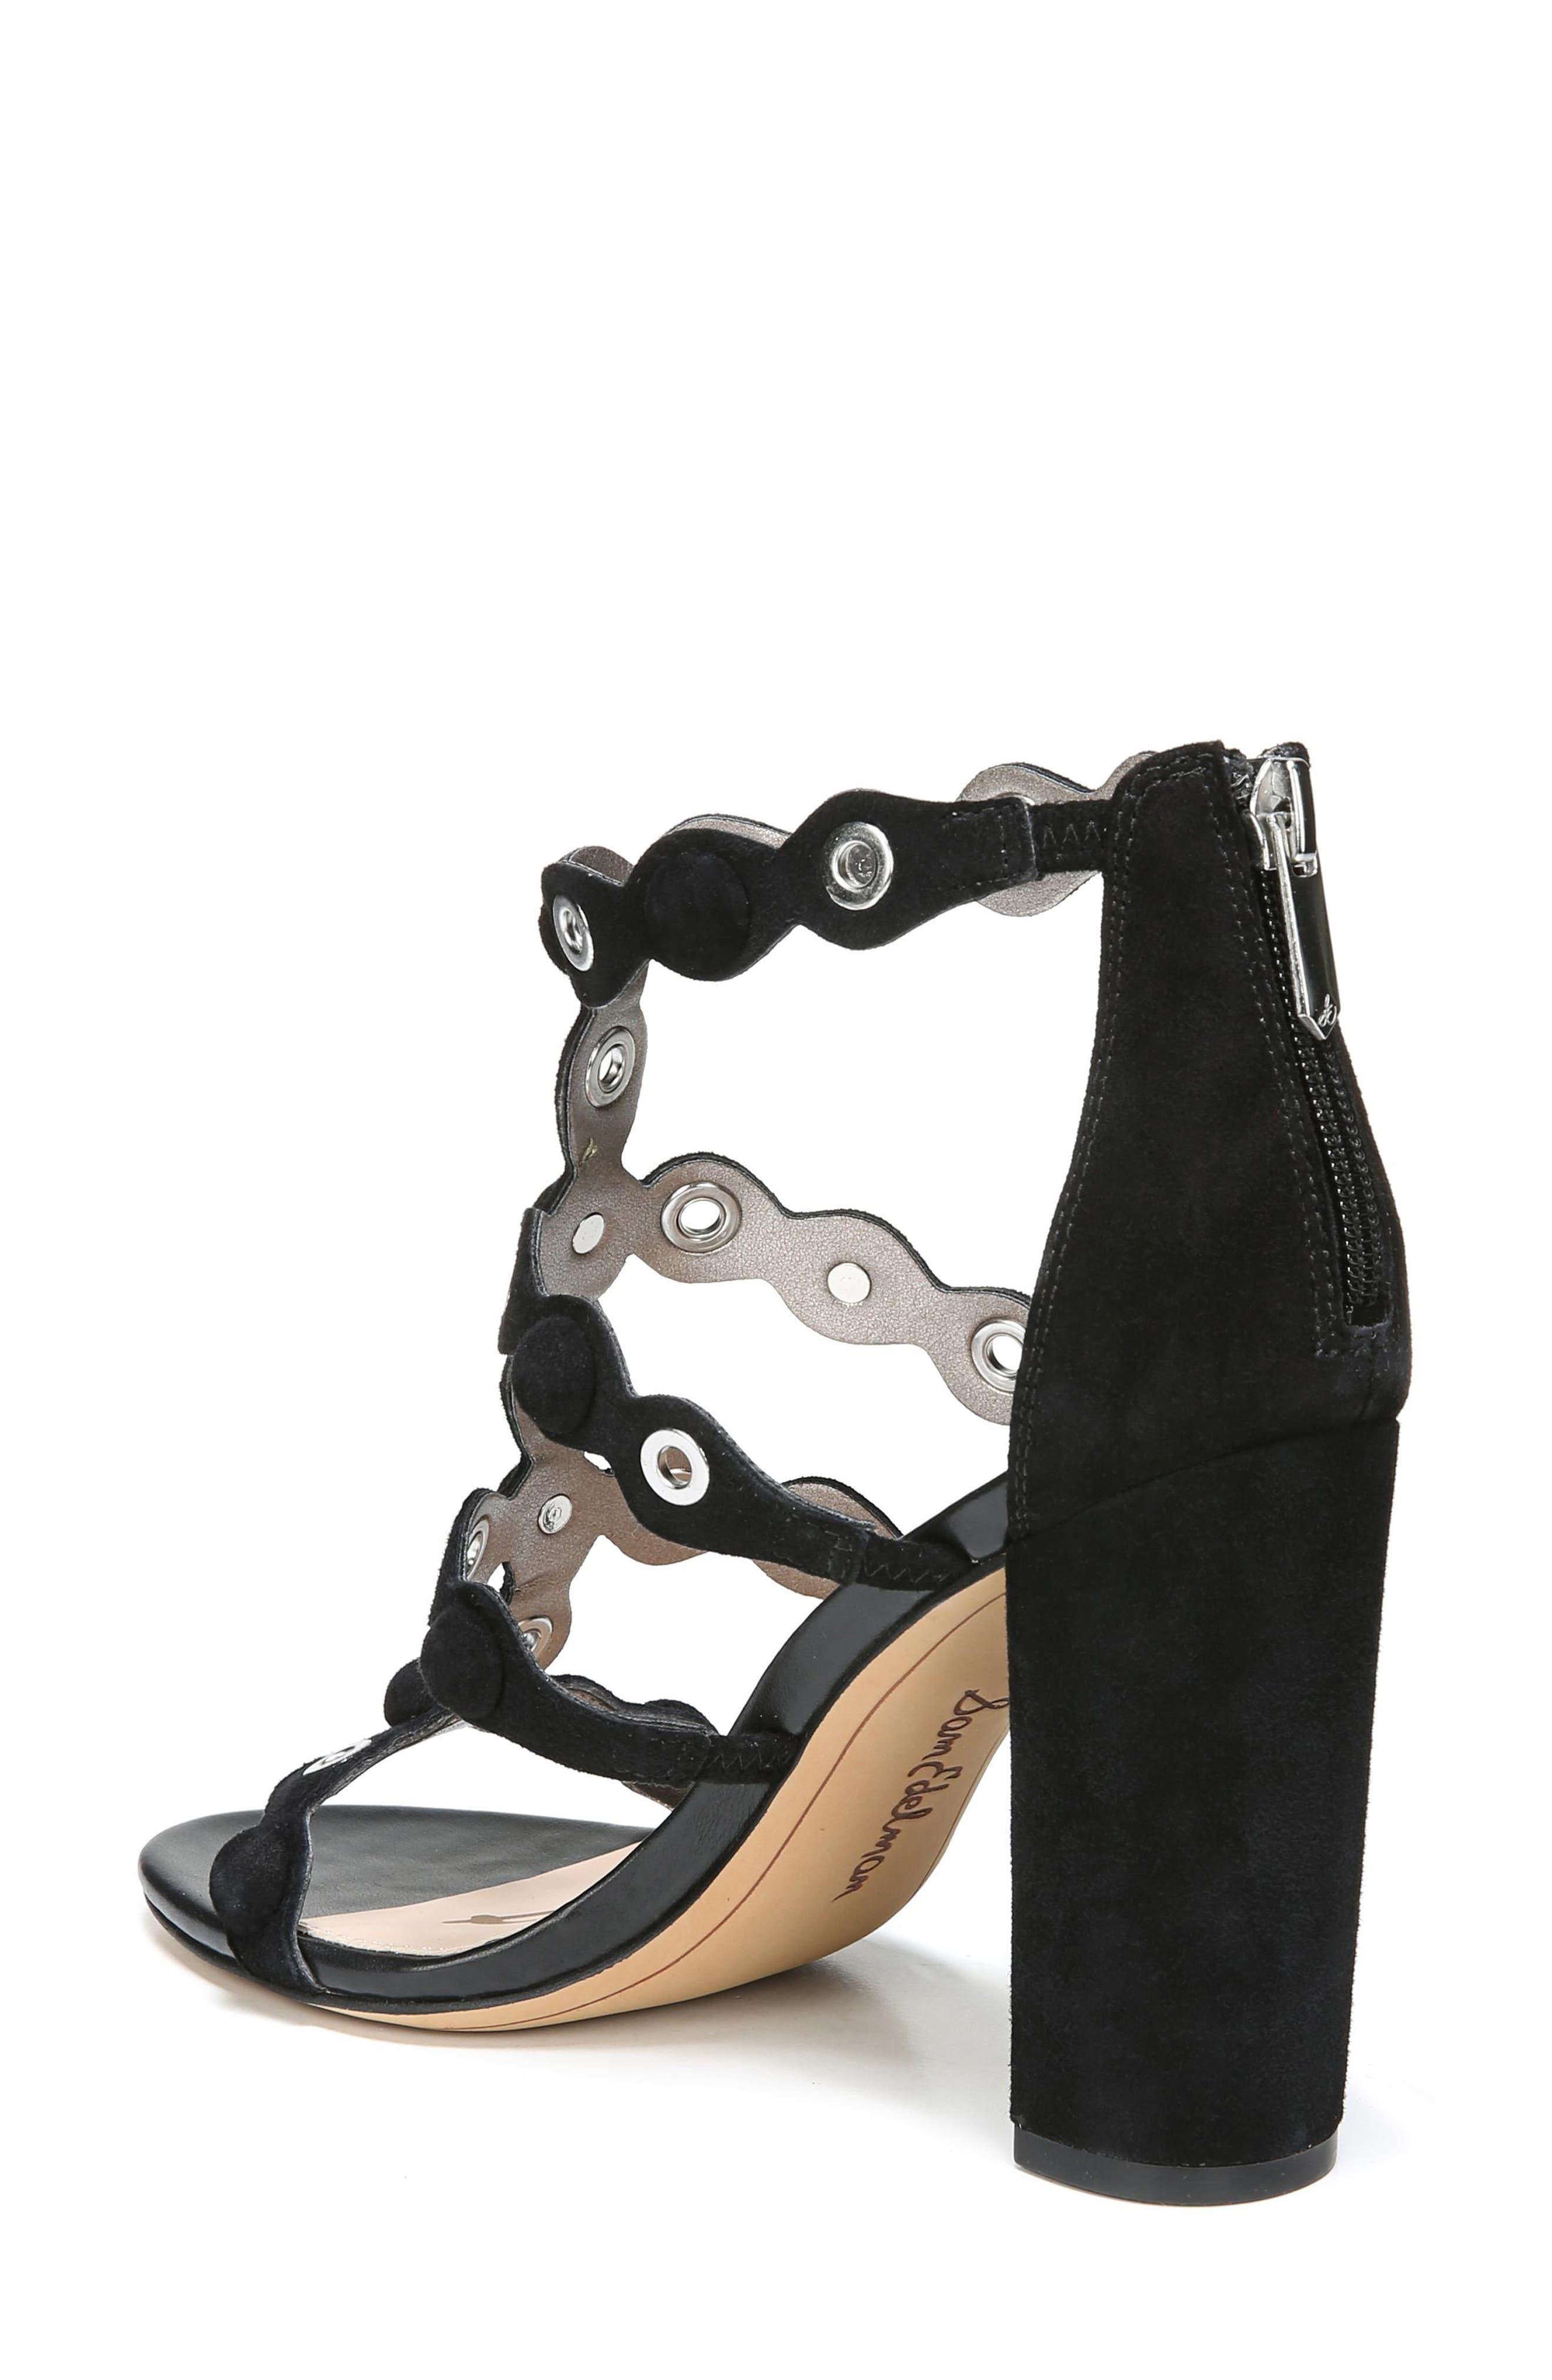 Yuli Grommet Sandal,                             Alternate thumbnail 2, color,                             Black Leather